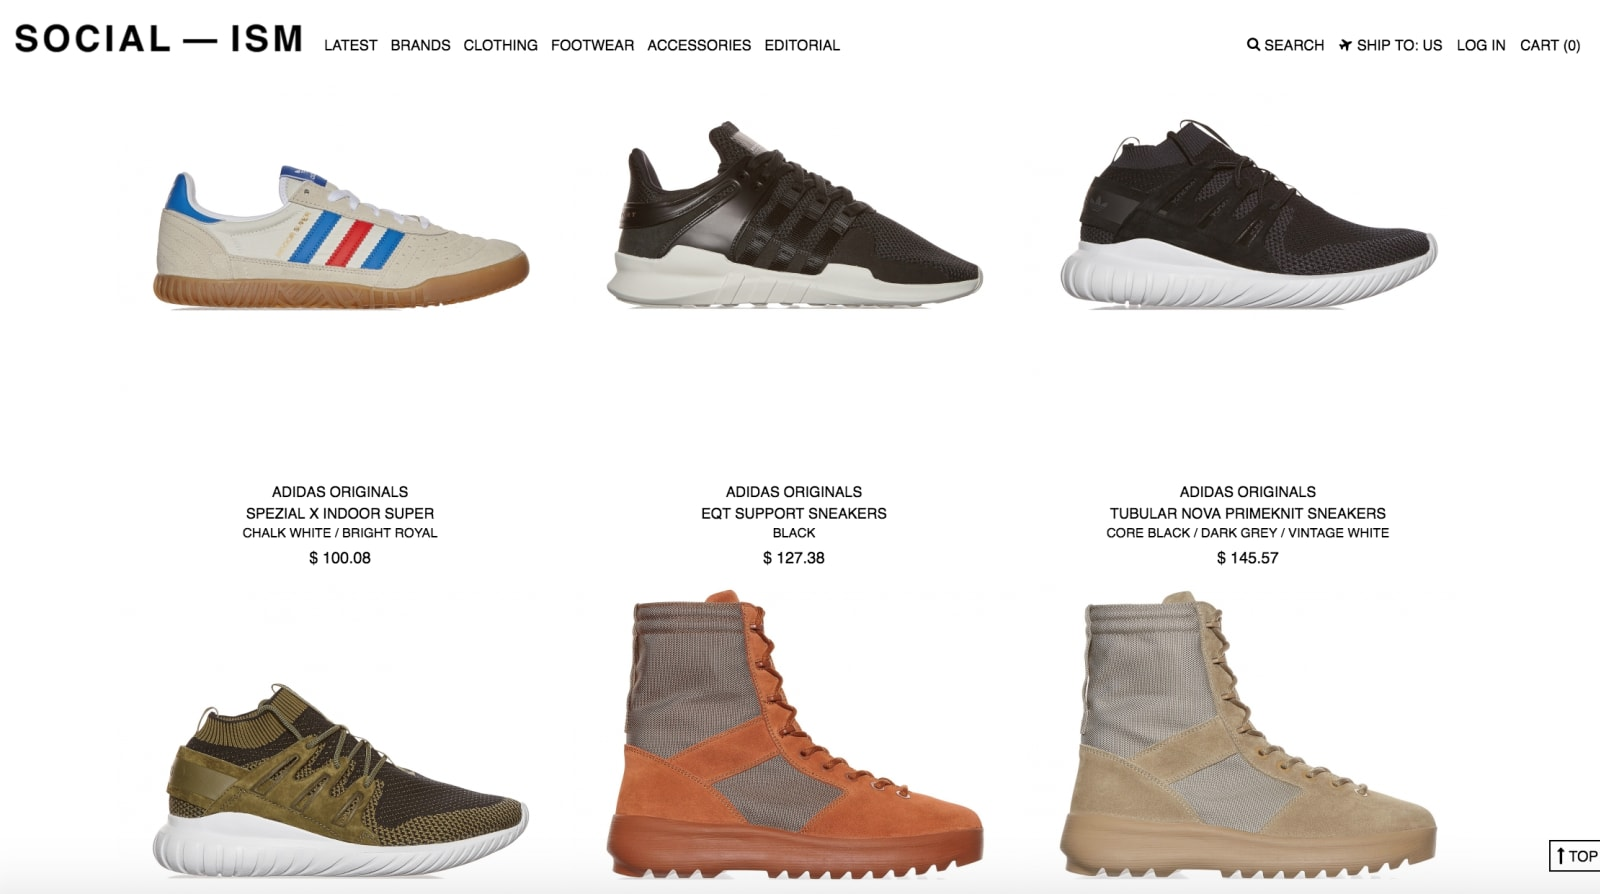 95552dbf Nikestore - Black Friday Sneaker Deals 2016   Sole Collector